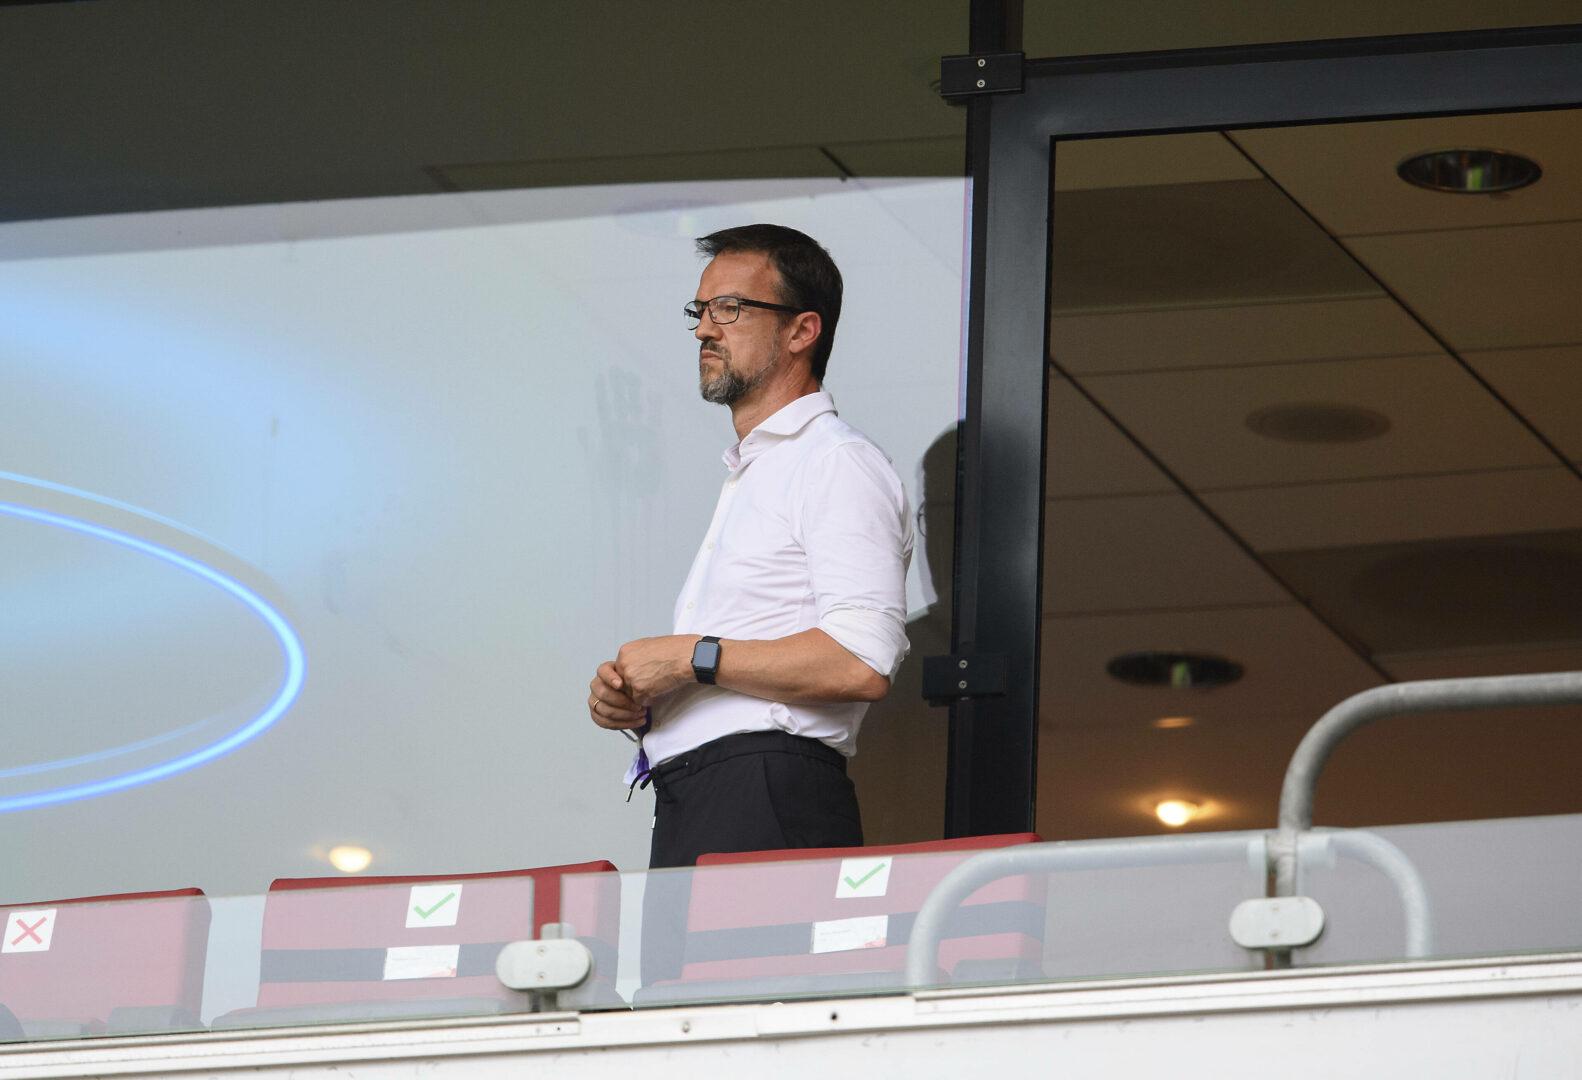 Fredi Bobic (Hertha BSC) auf der Tribüne